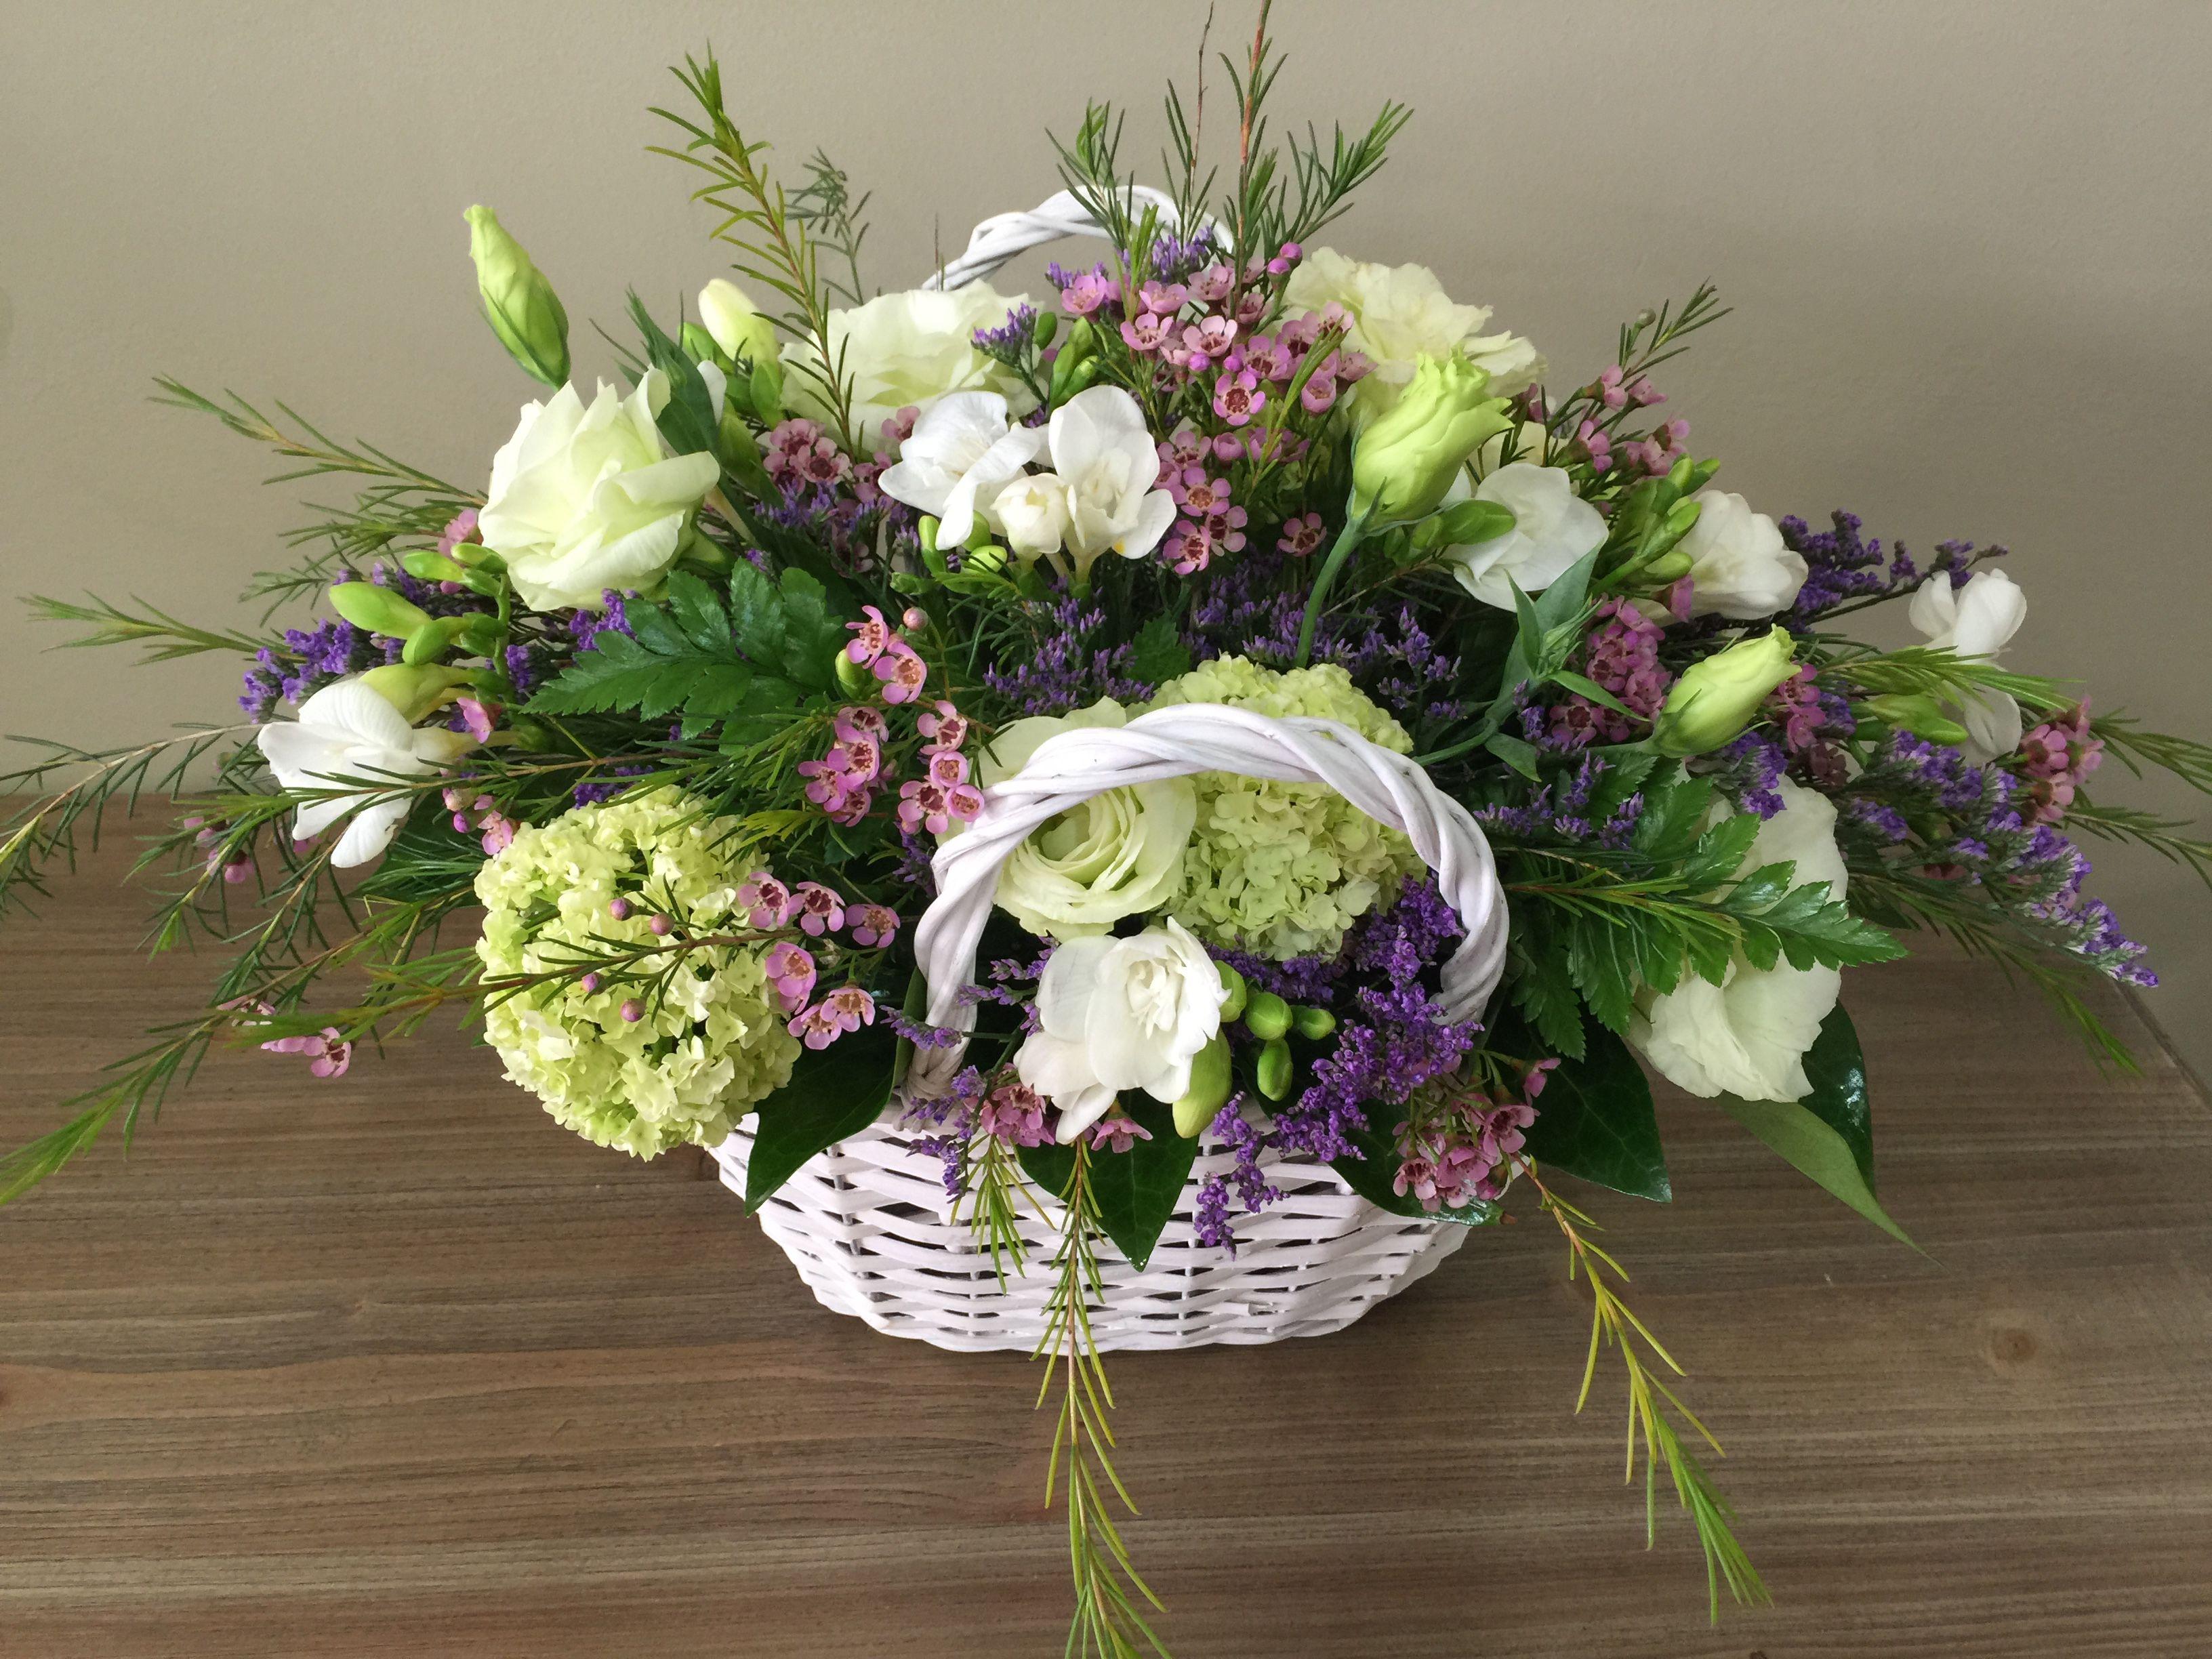 Gran cesta de flores selectas, producto extraordinario elaborado con ...